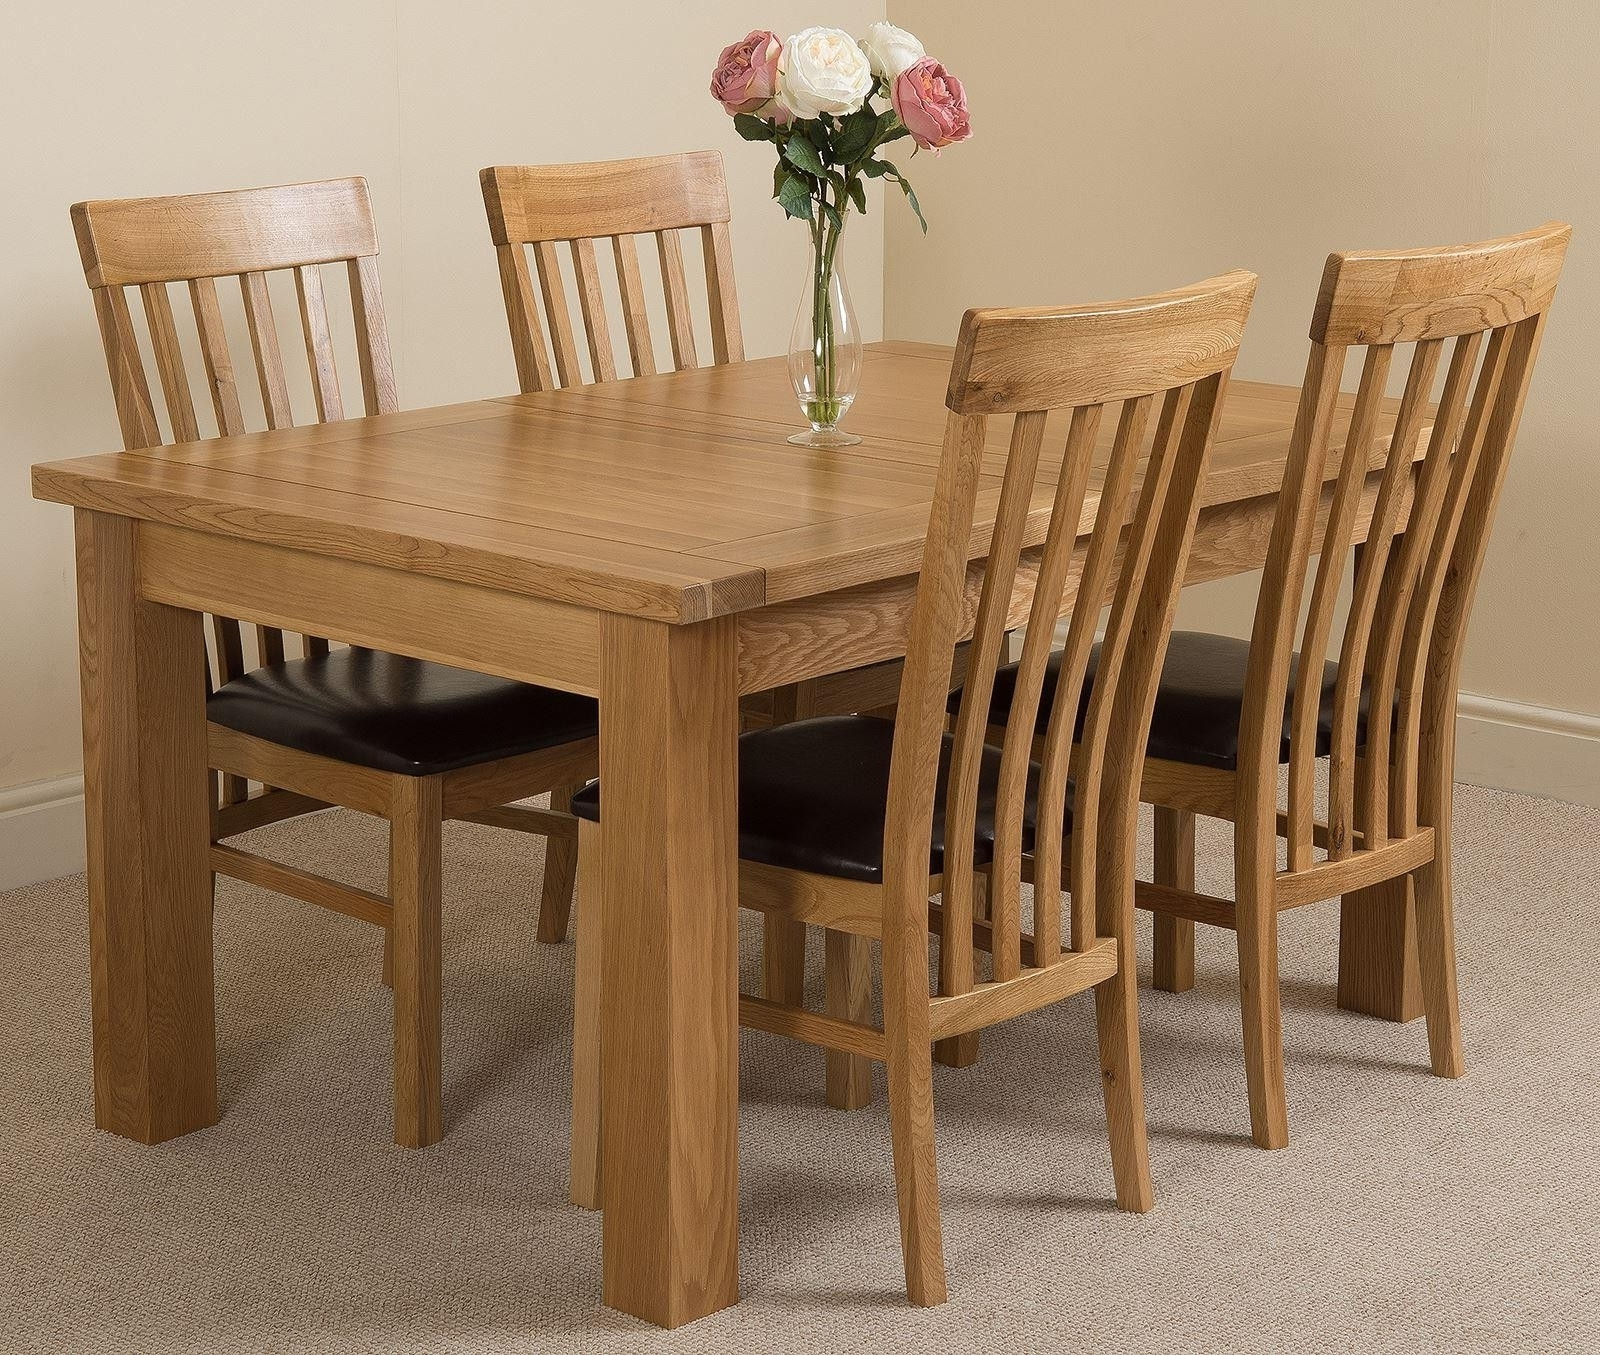 Oak Furniture King (View 17 of 25)